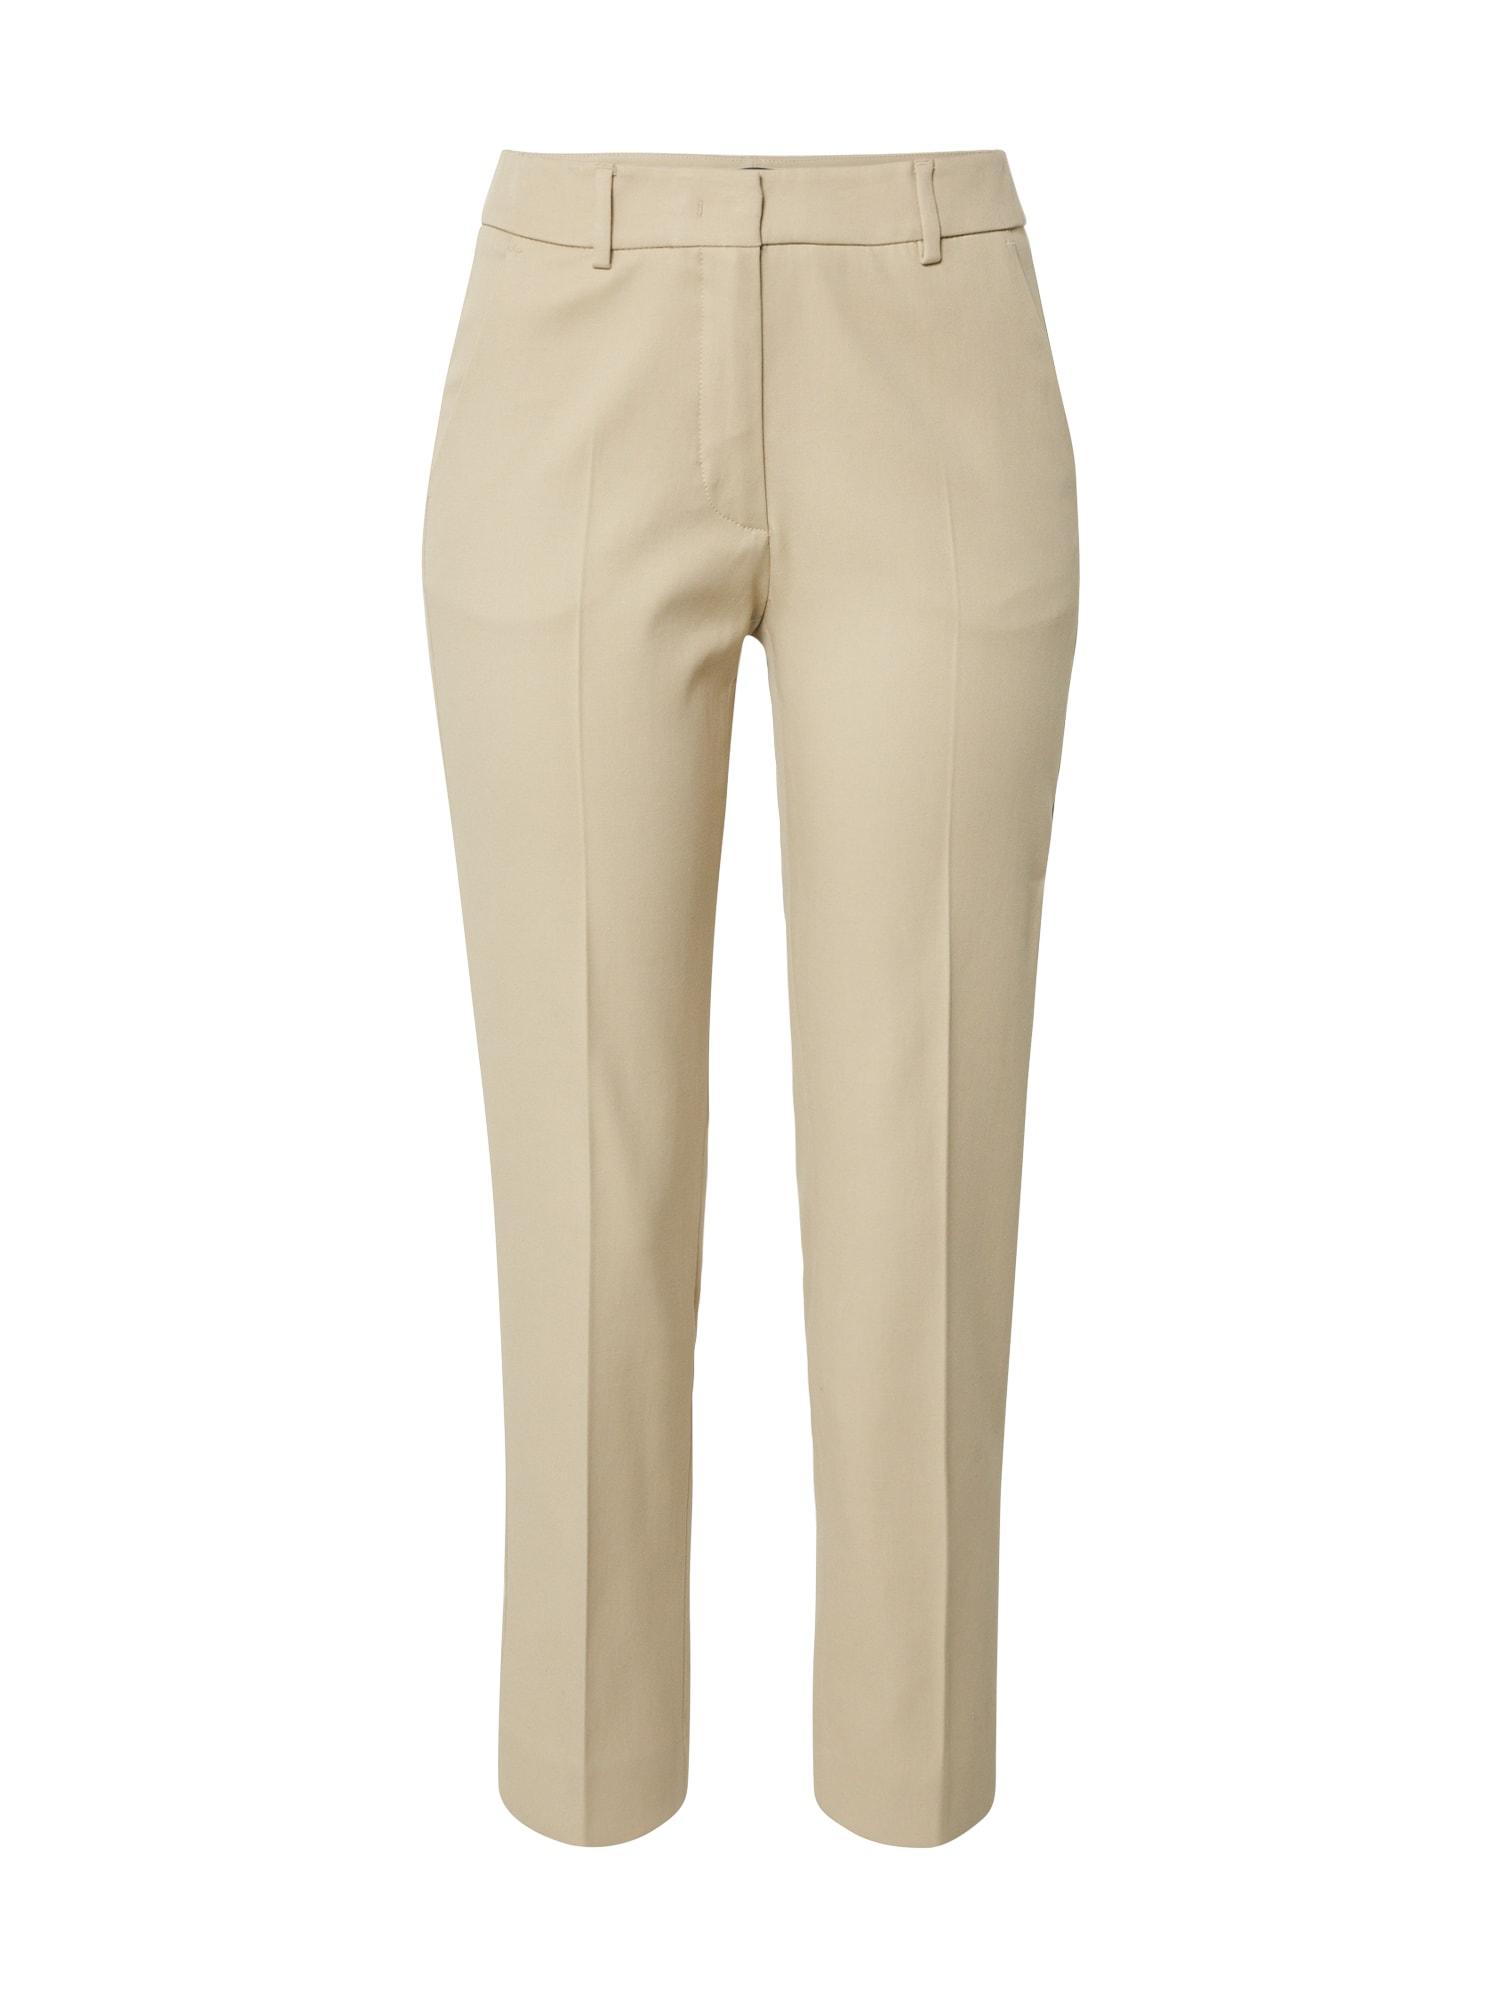 Weekend Max Mara Chino stiliaus kelnės 'LEGENDA' kapučino spalva